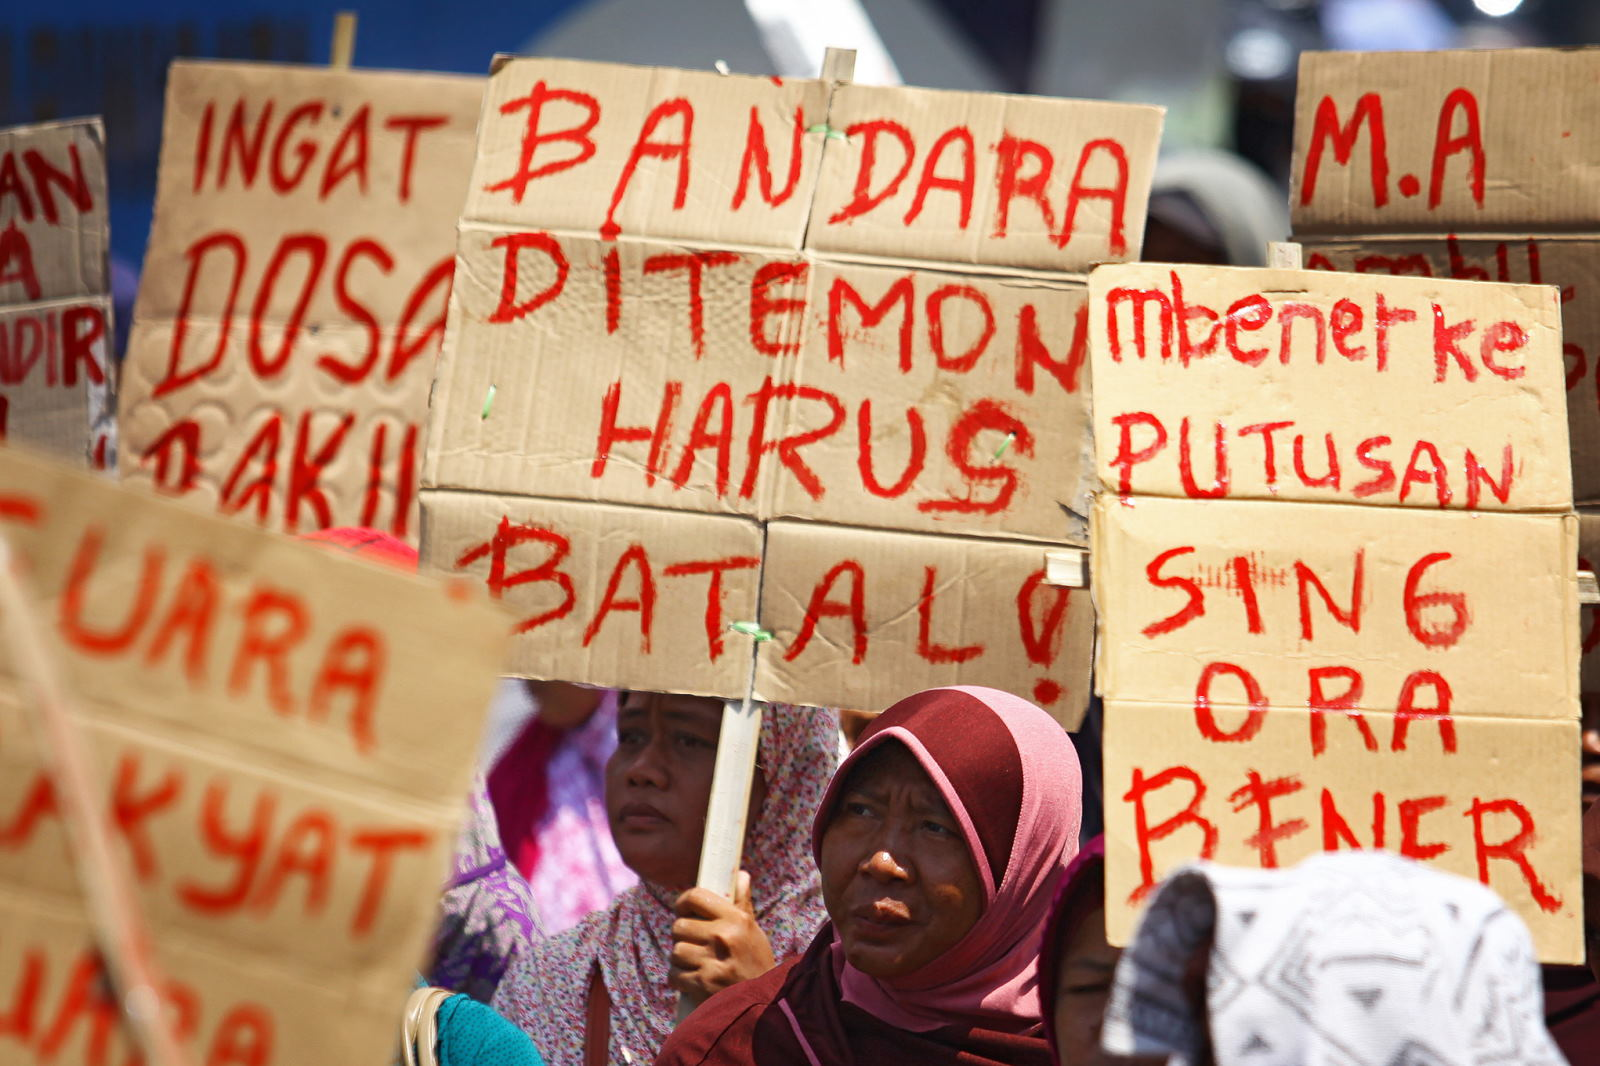 Kronologi Pengosongan Lahan untuk Bandara Menurut Warga Kulon Progo